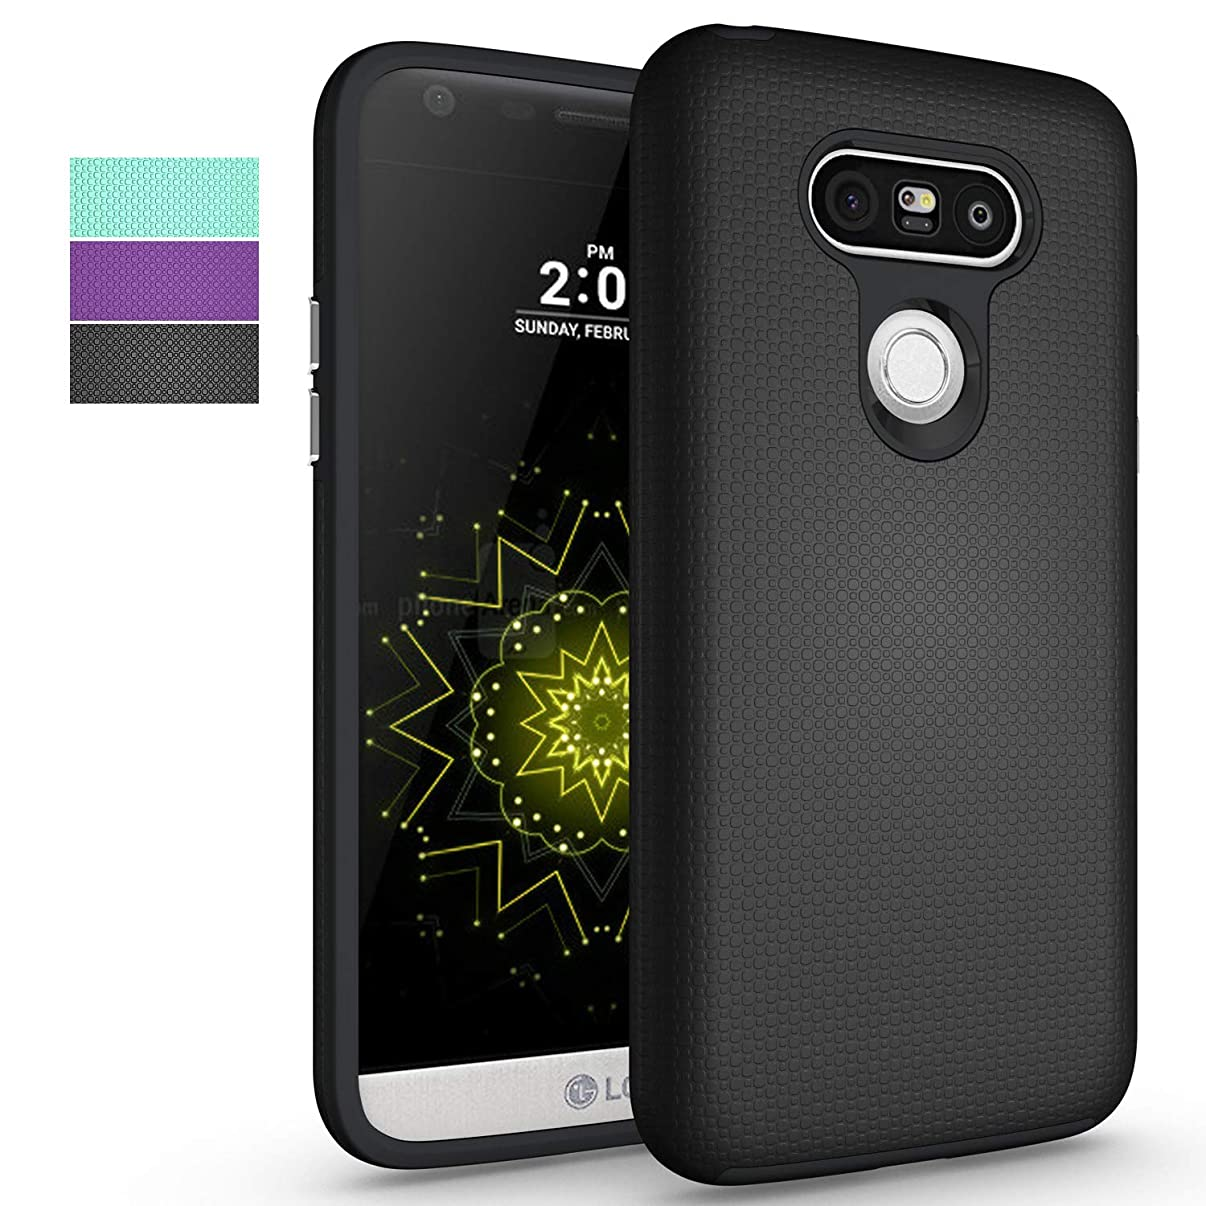 LG G5 Phone Case,NiuBox Slim Fit Dual Layer Armor [PC + TPU Hybrid] Anti-Slip Shock Absorption Protective Phone Case Cover for LG G5 (T-Mobile,Unlocked,Verizon) - Black